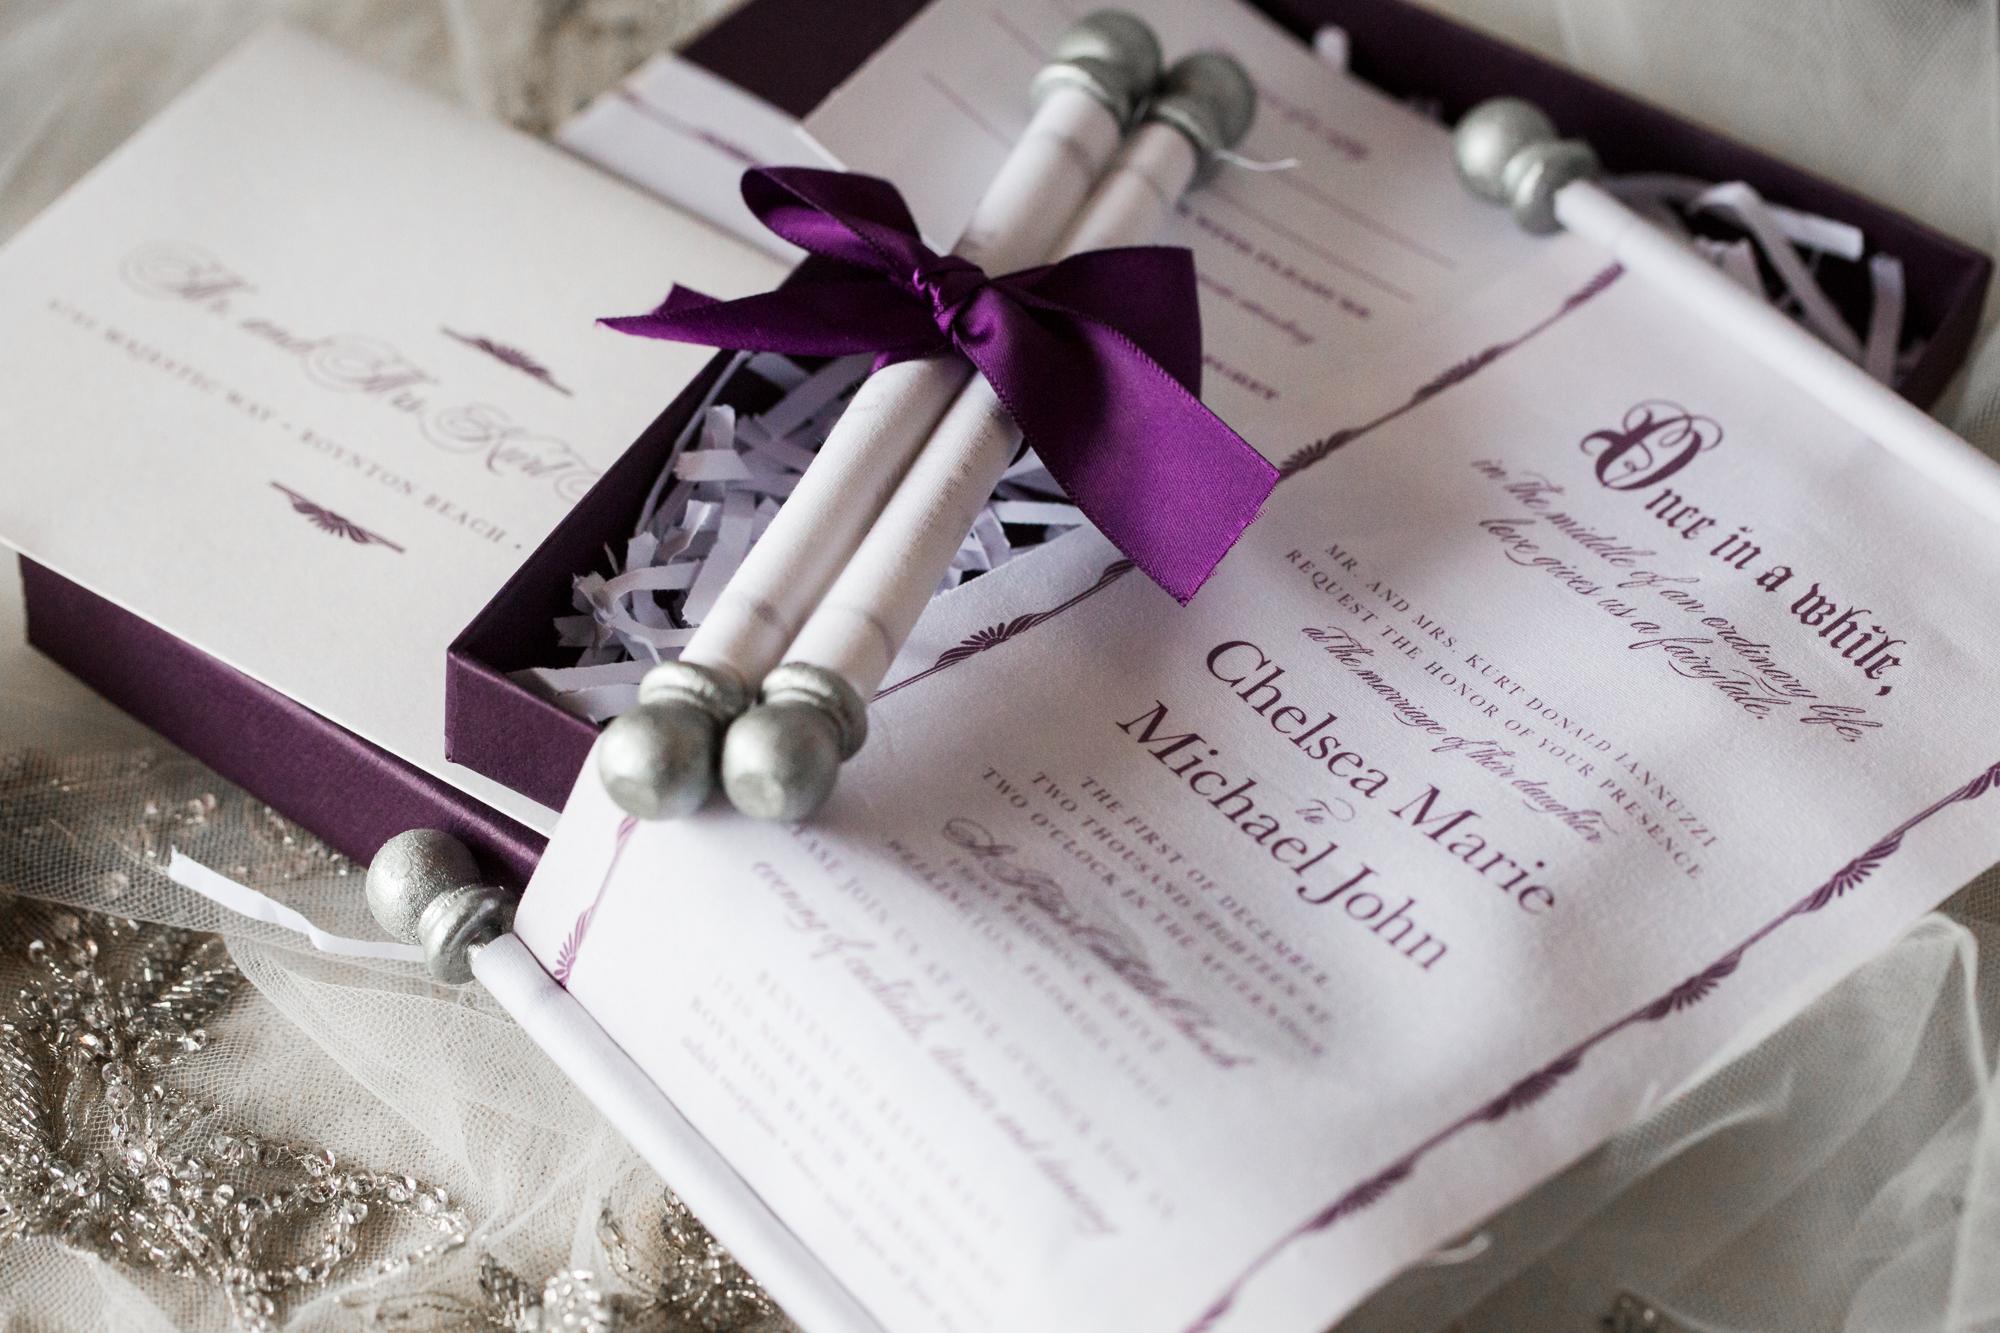 Benvenuto_Wedding_catholic_Florida_Bride-Groom-3-2.jpg